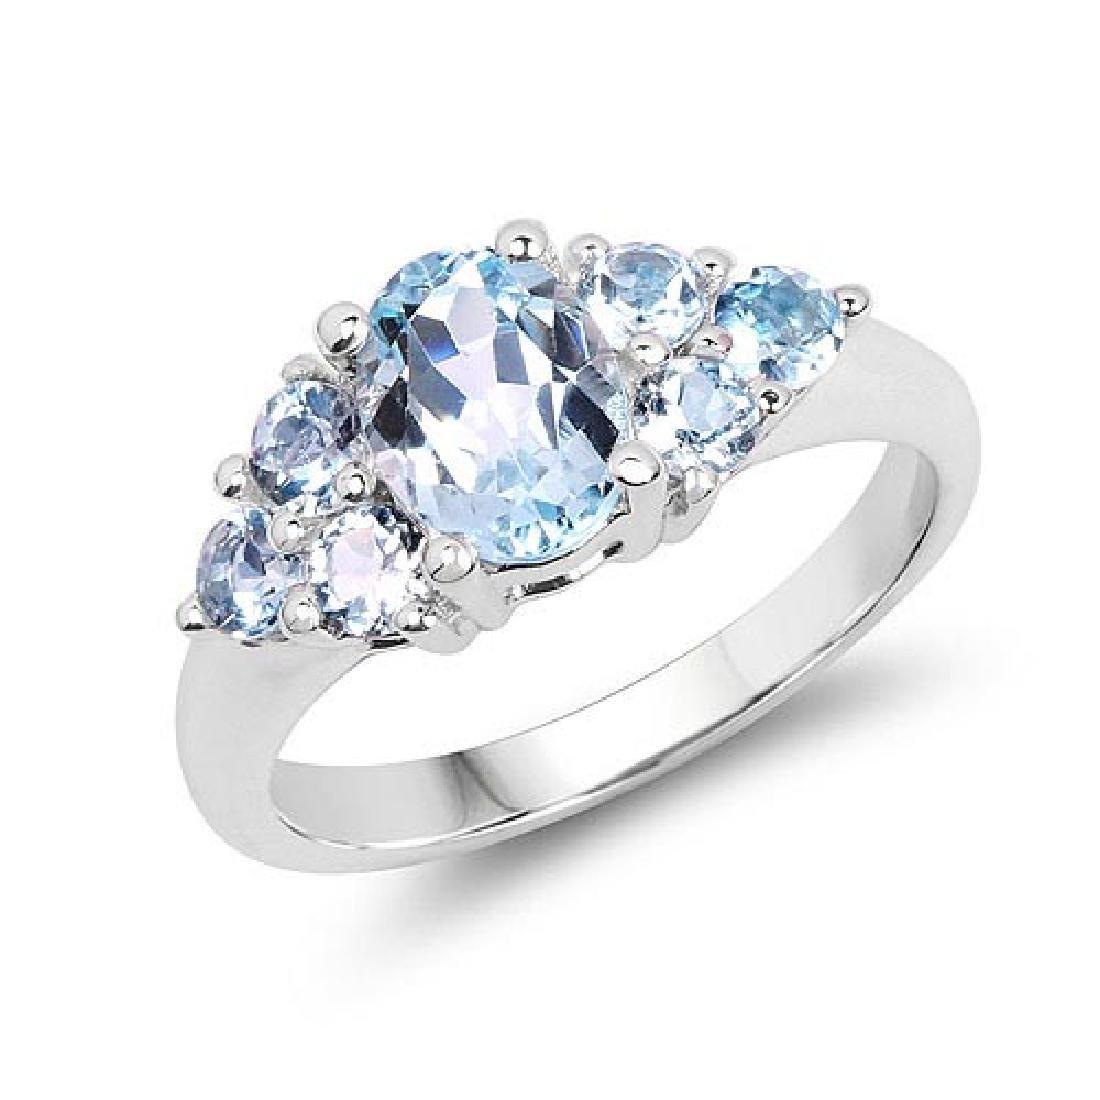 2.32 Carat Genuine Blue Topaz .925 Sterling Silver Ring